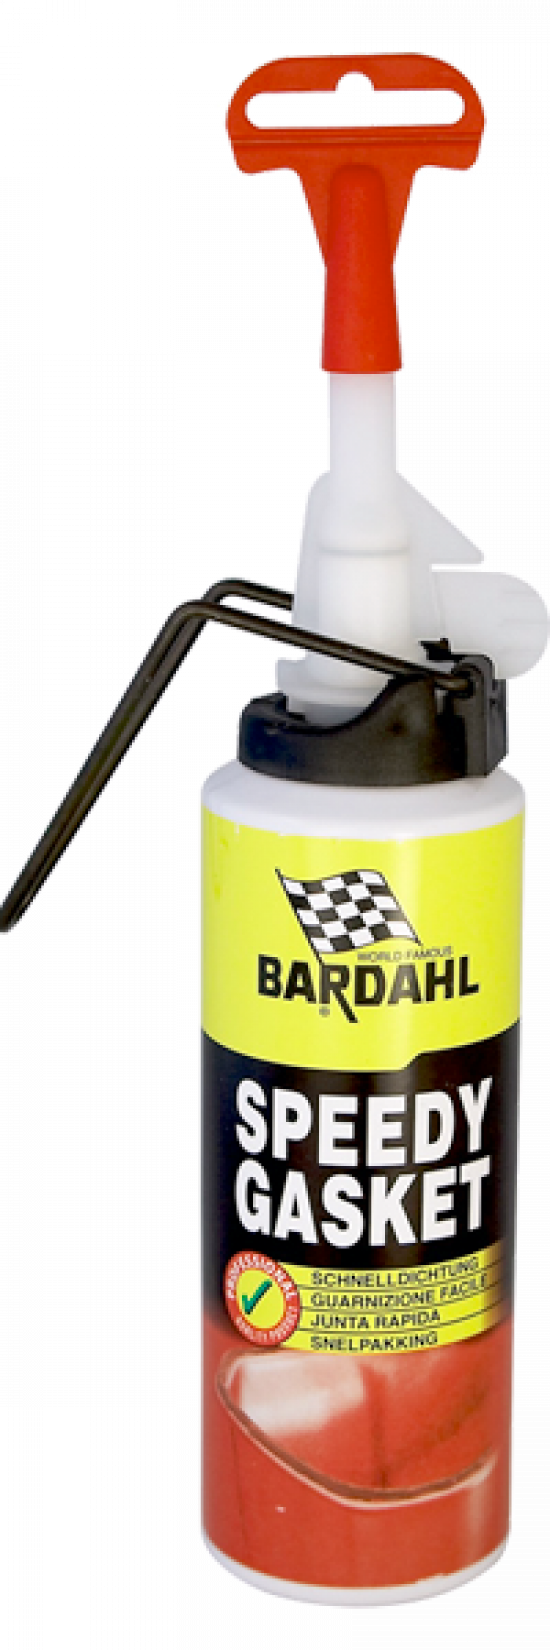 Bardahl SPEEDY GASKET